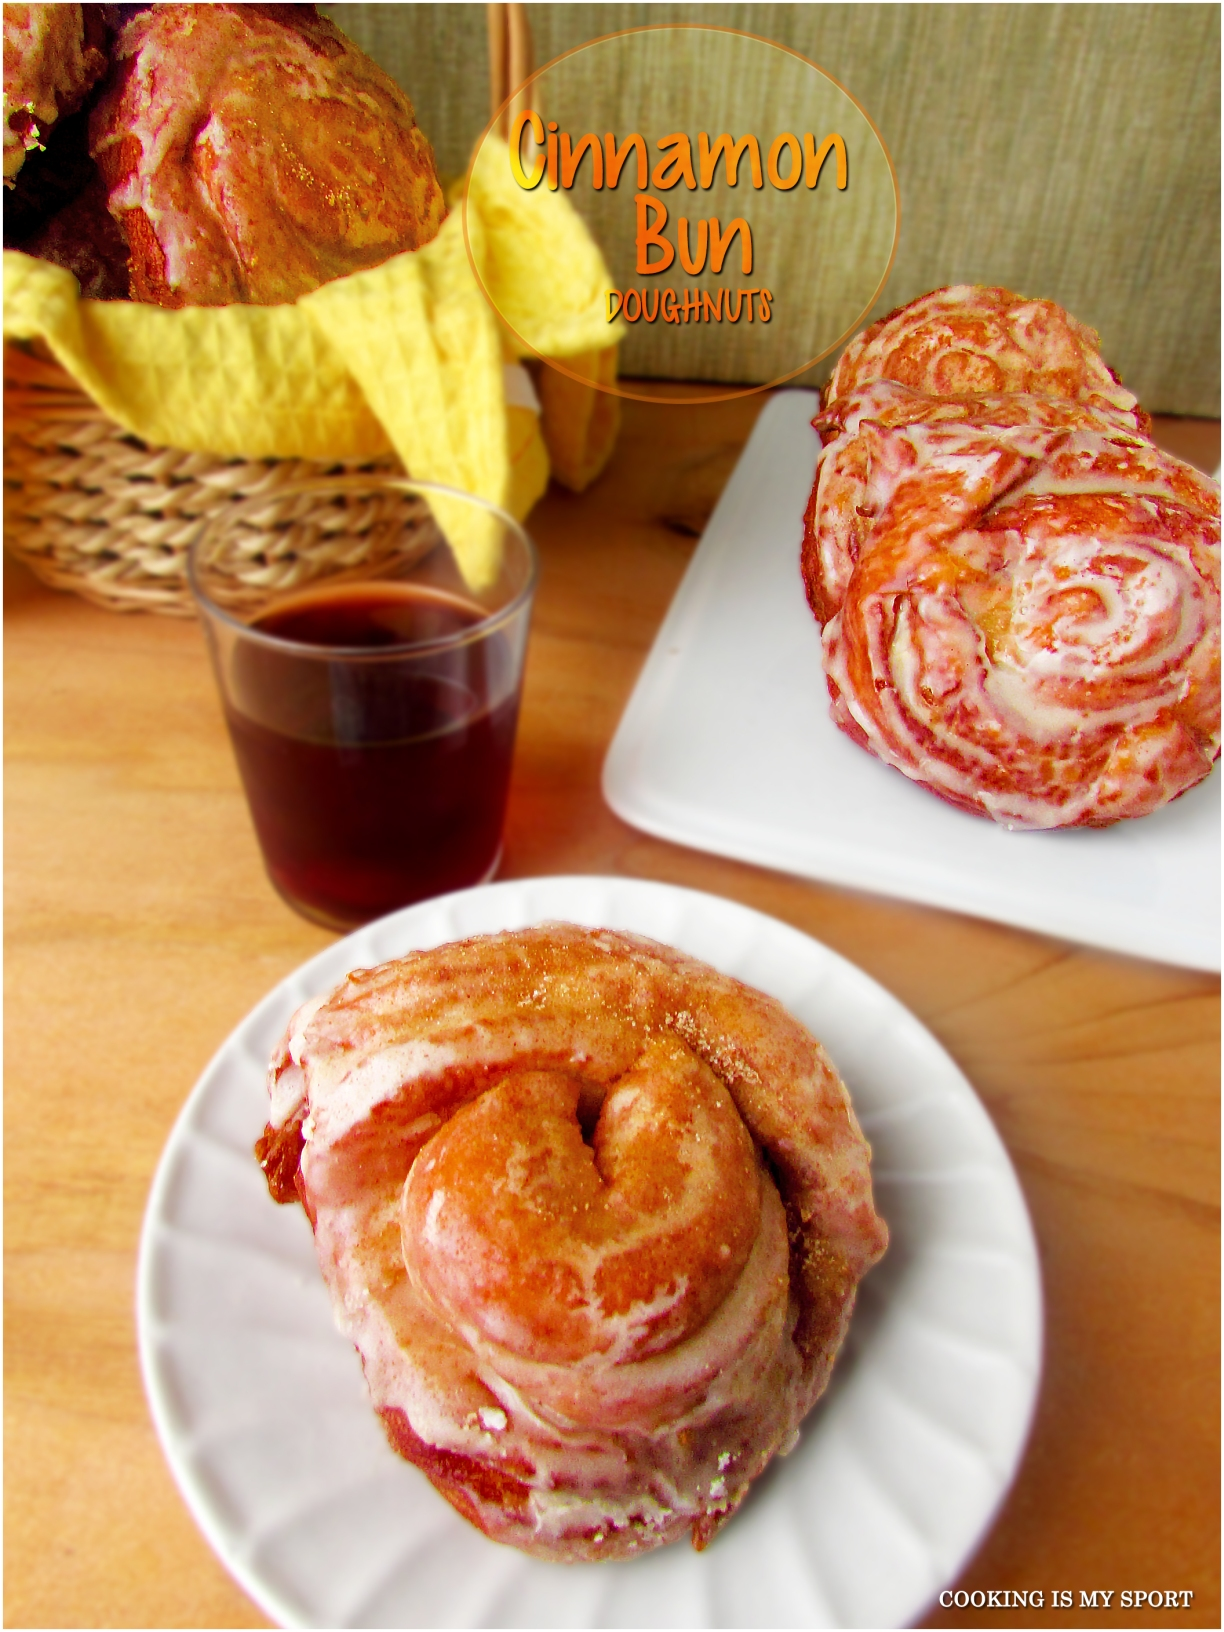 Cinnamon Bun Doughnuts3